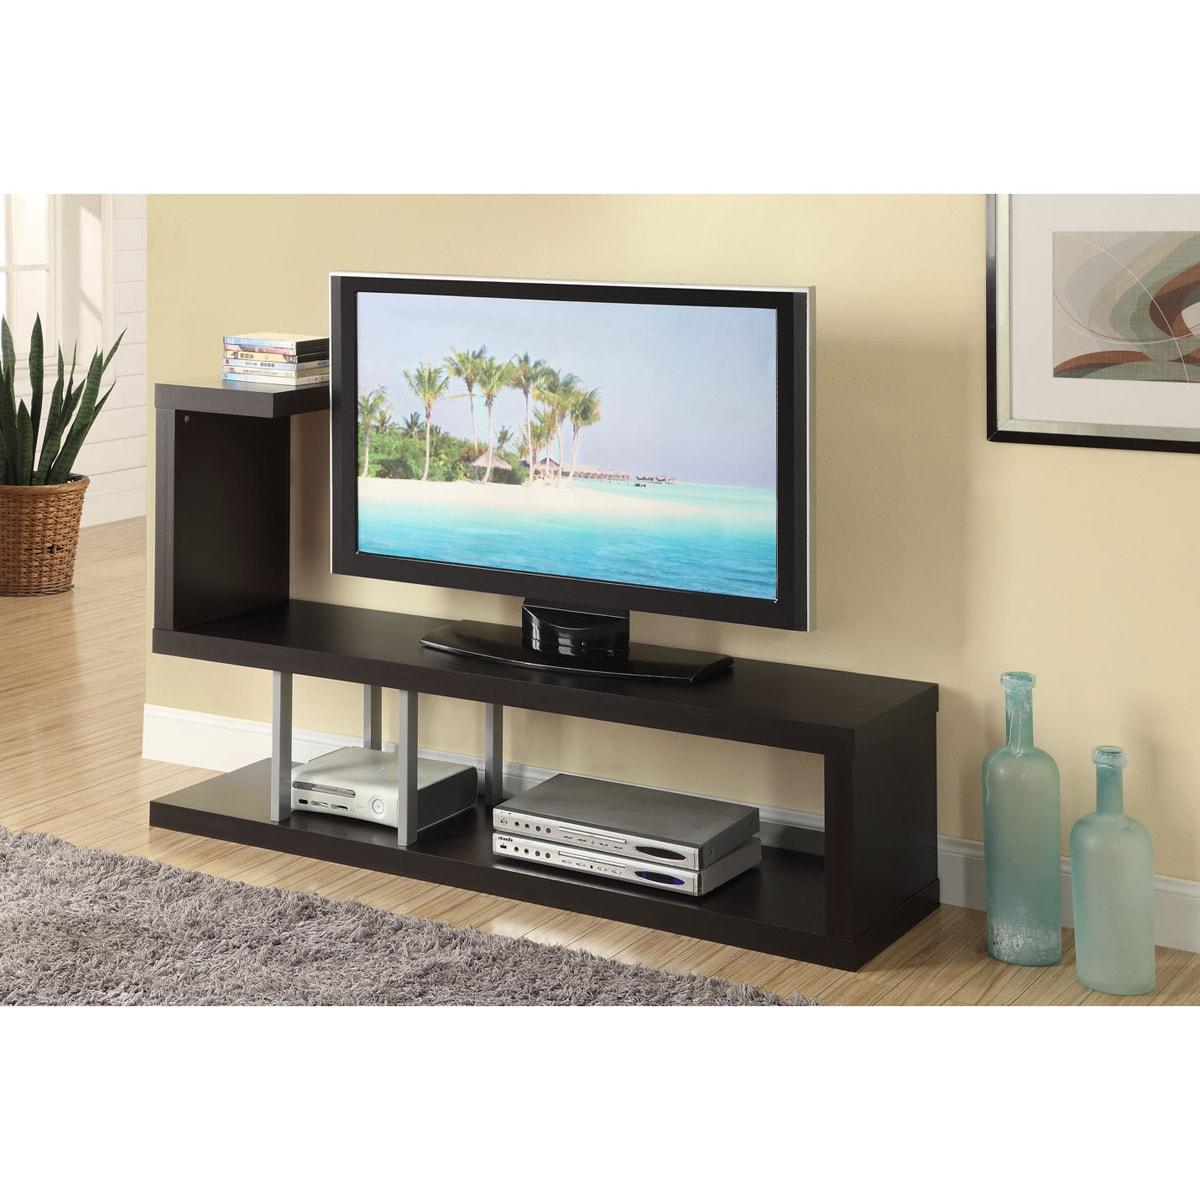 Shop Hollow core Cappuccino TV Console Free